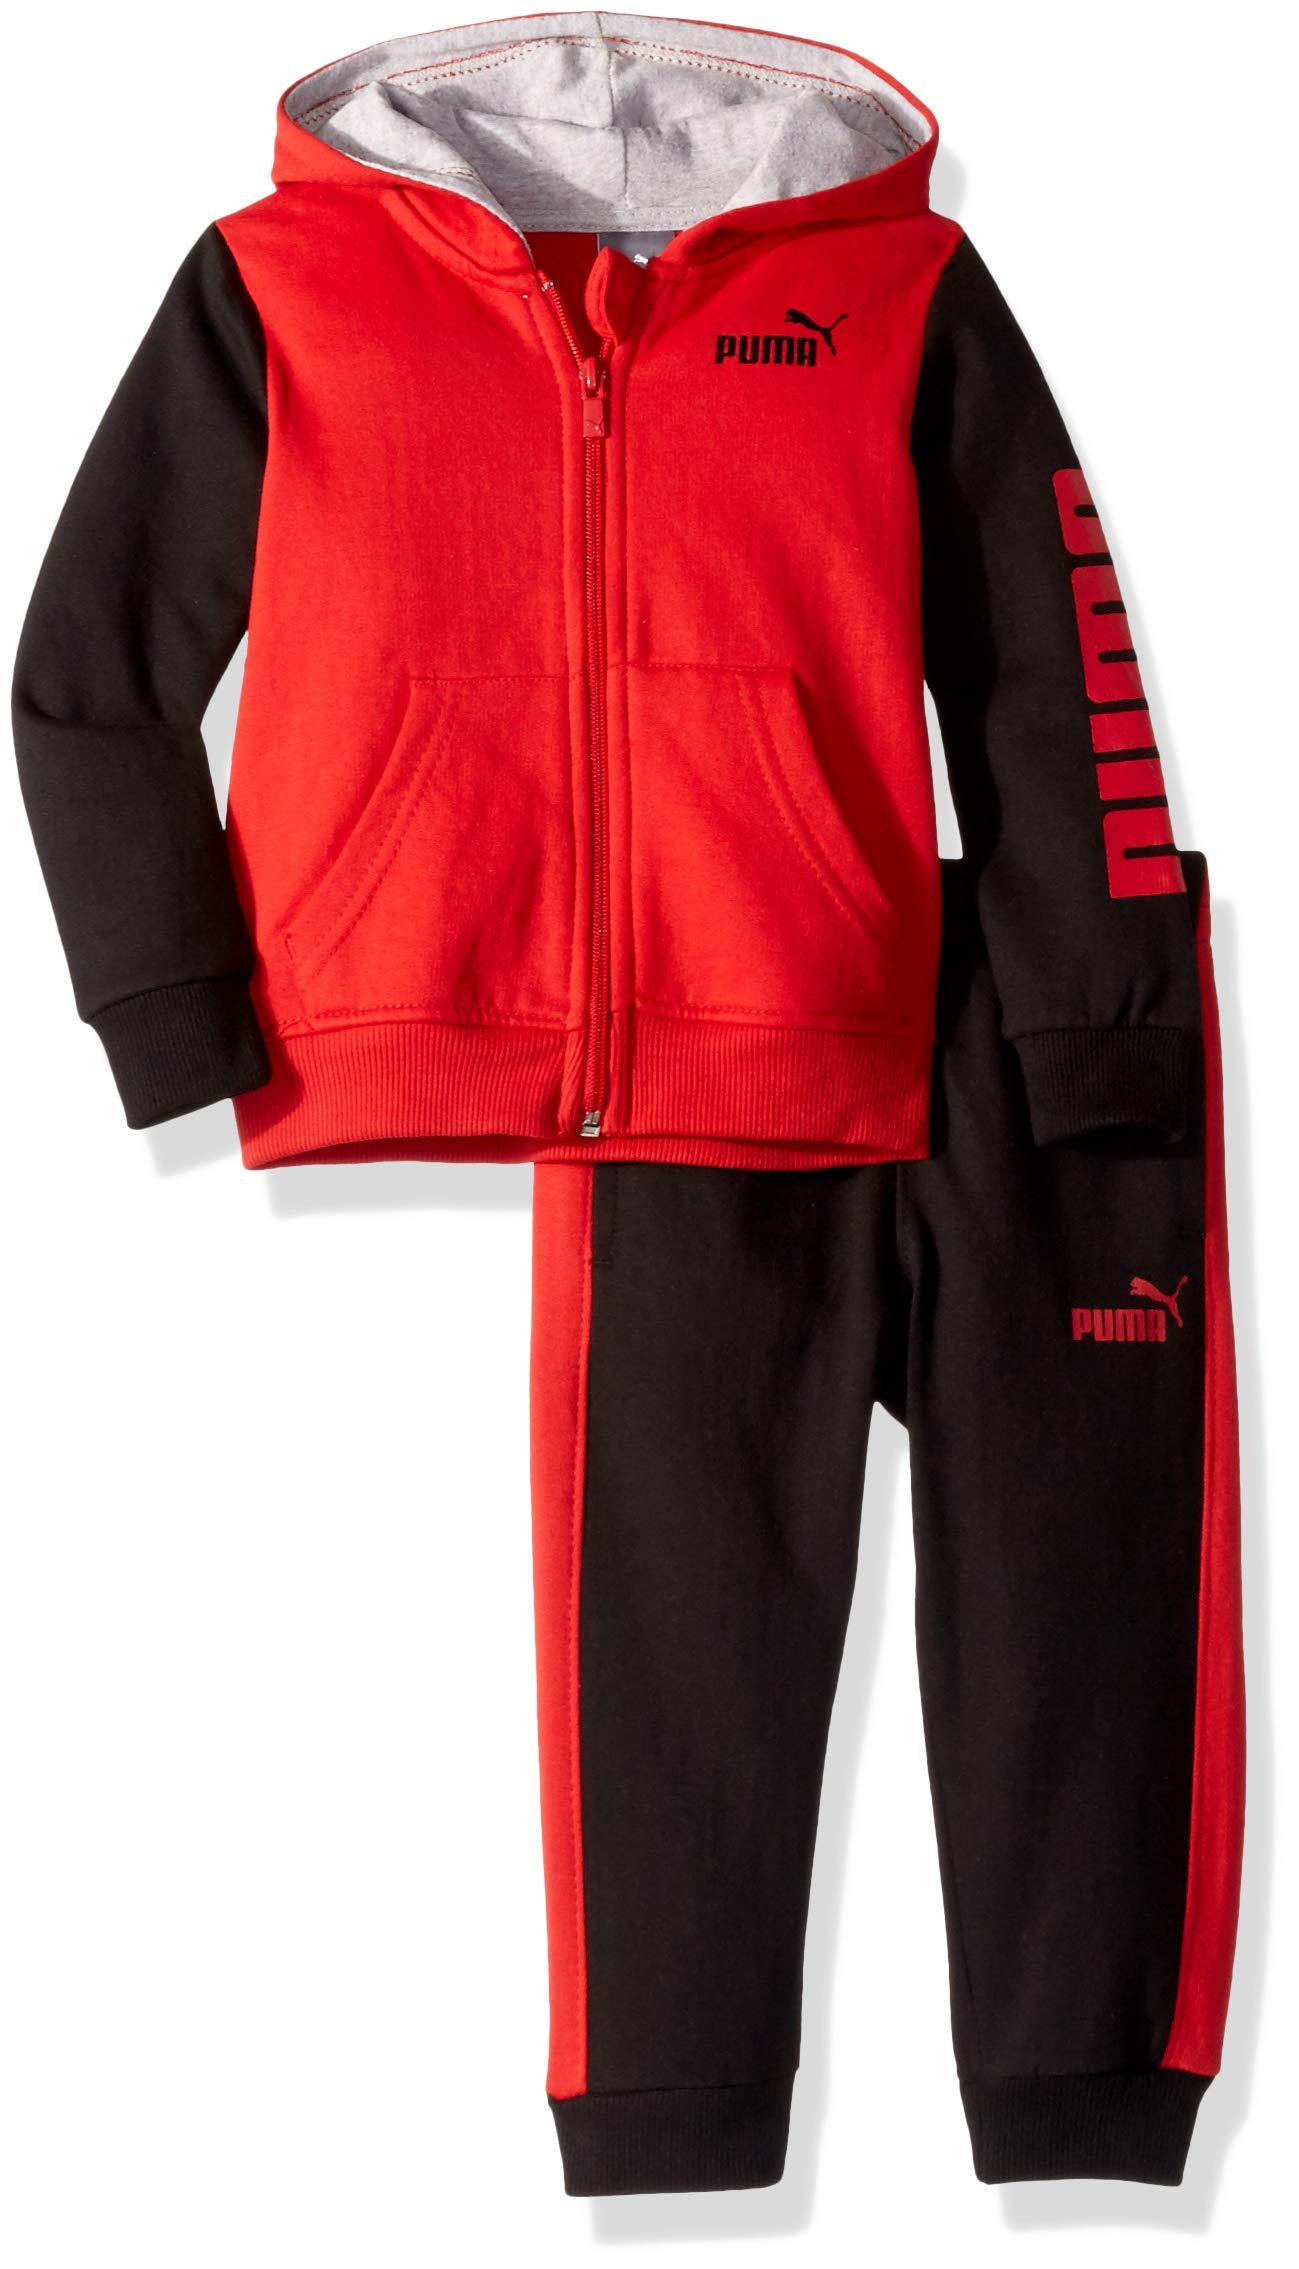 PUMA Toddler Boys' Fleece Zip Up Hoodie Set, Ribbon red, 4T by PUMA